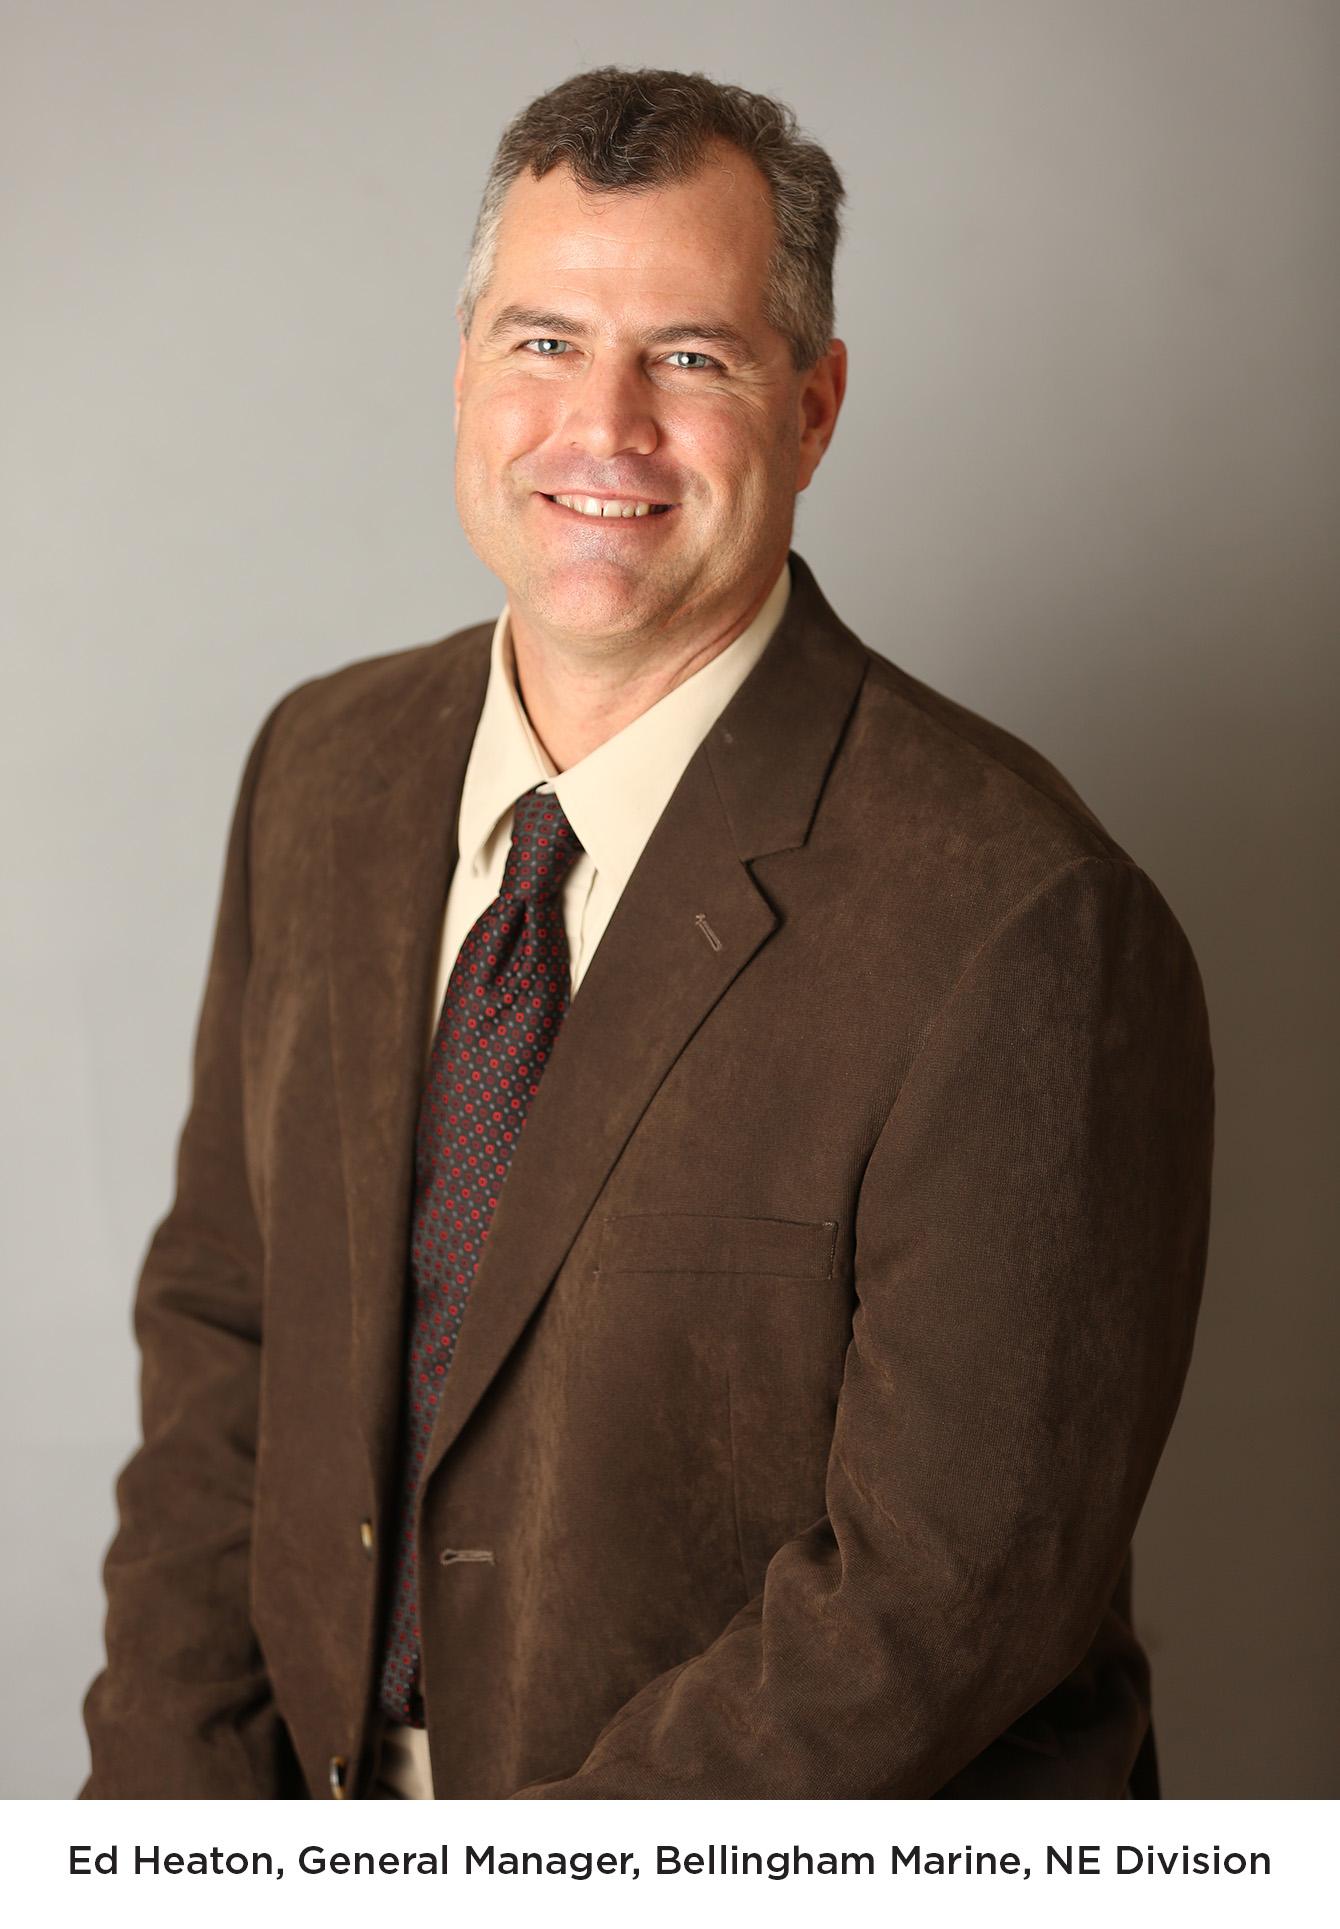 Ed Heaton, General Manager, Bellingham Marine NE Division